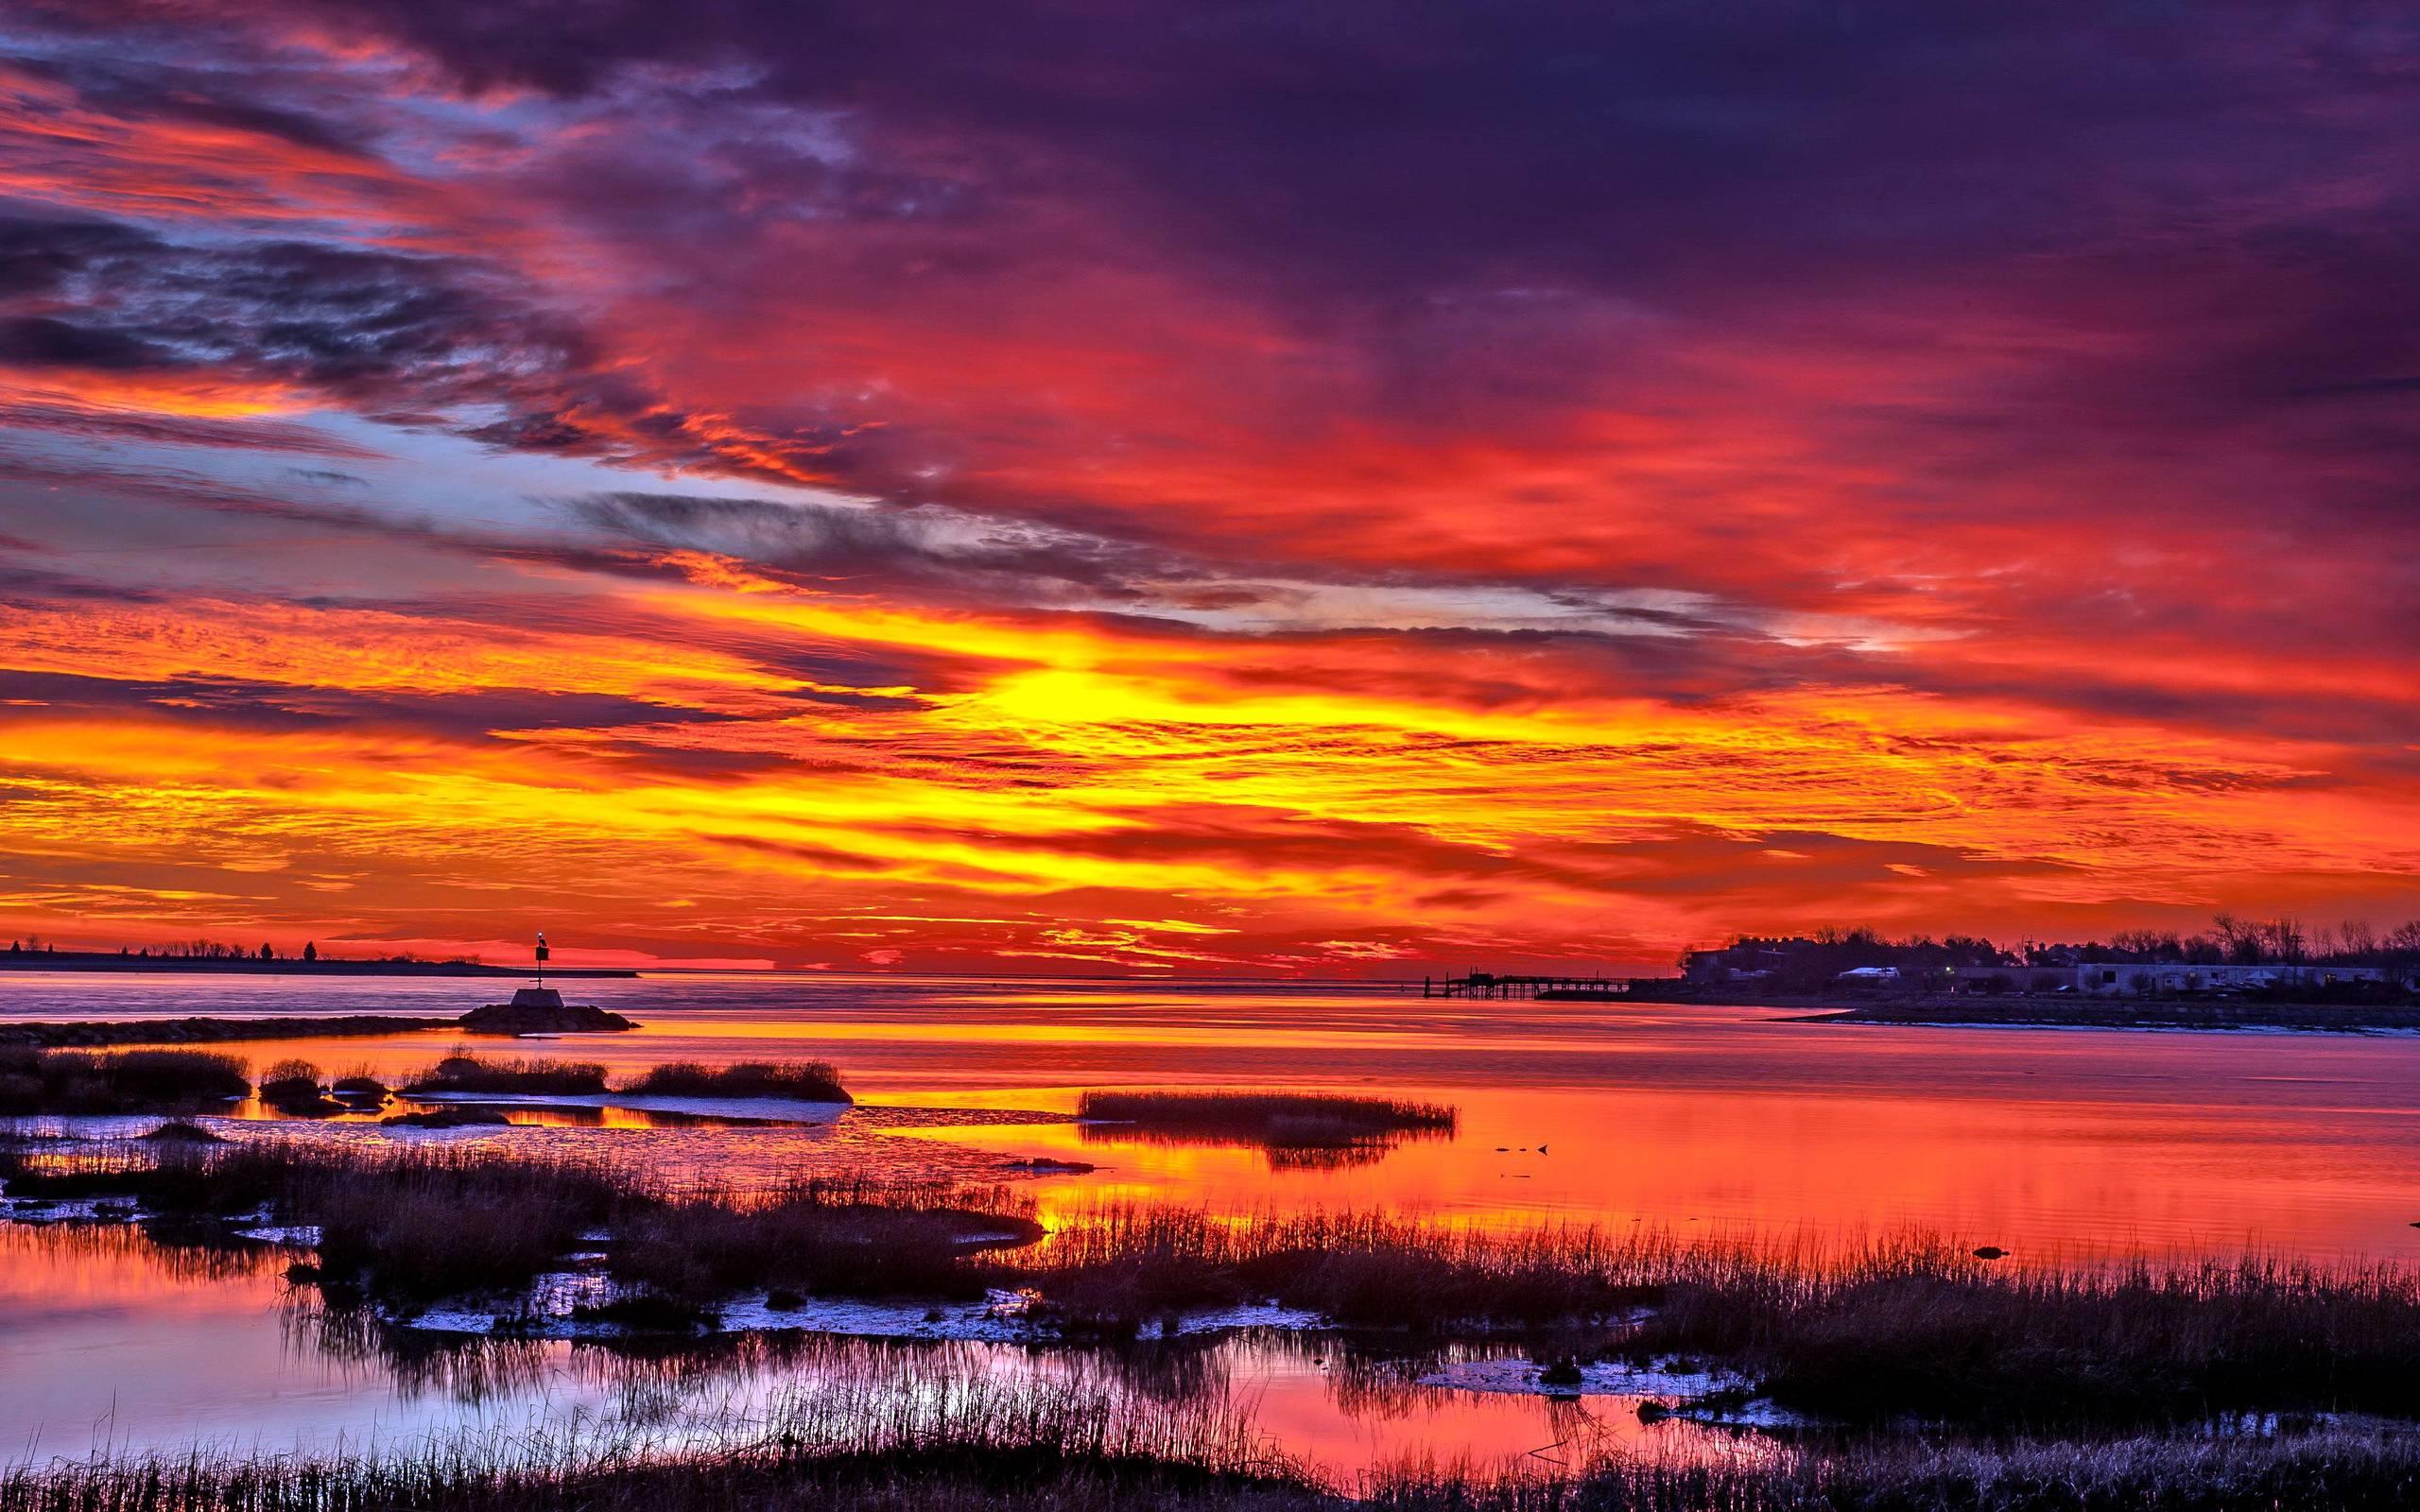 Sunset Landscape Wallpapers - Wallpaper ...